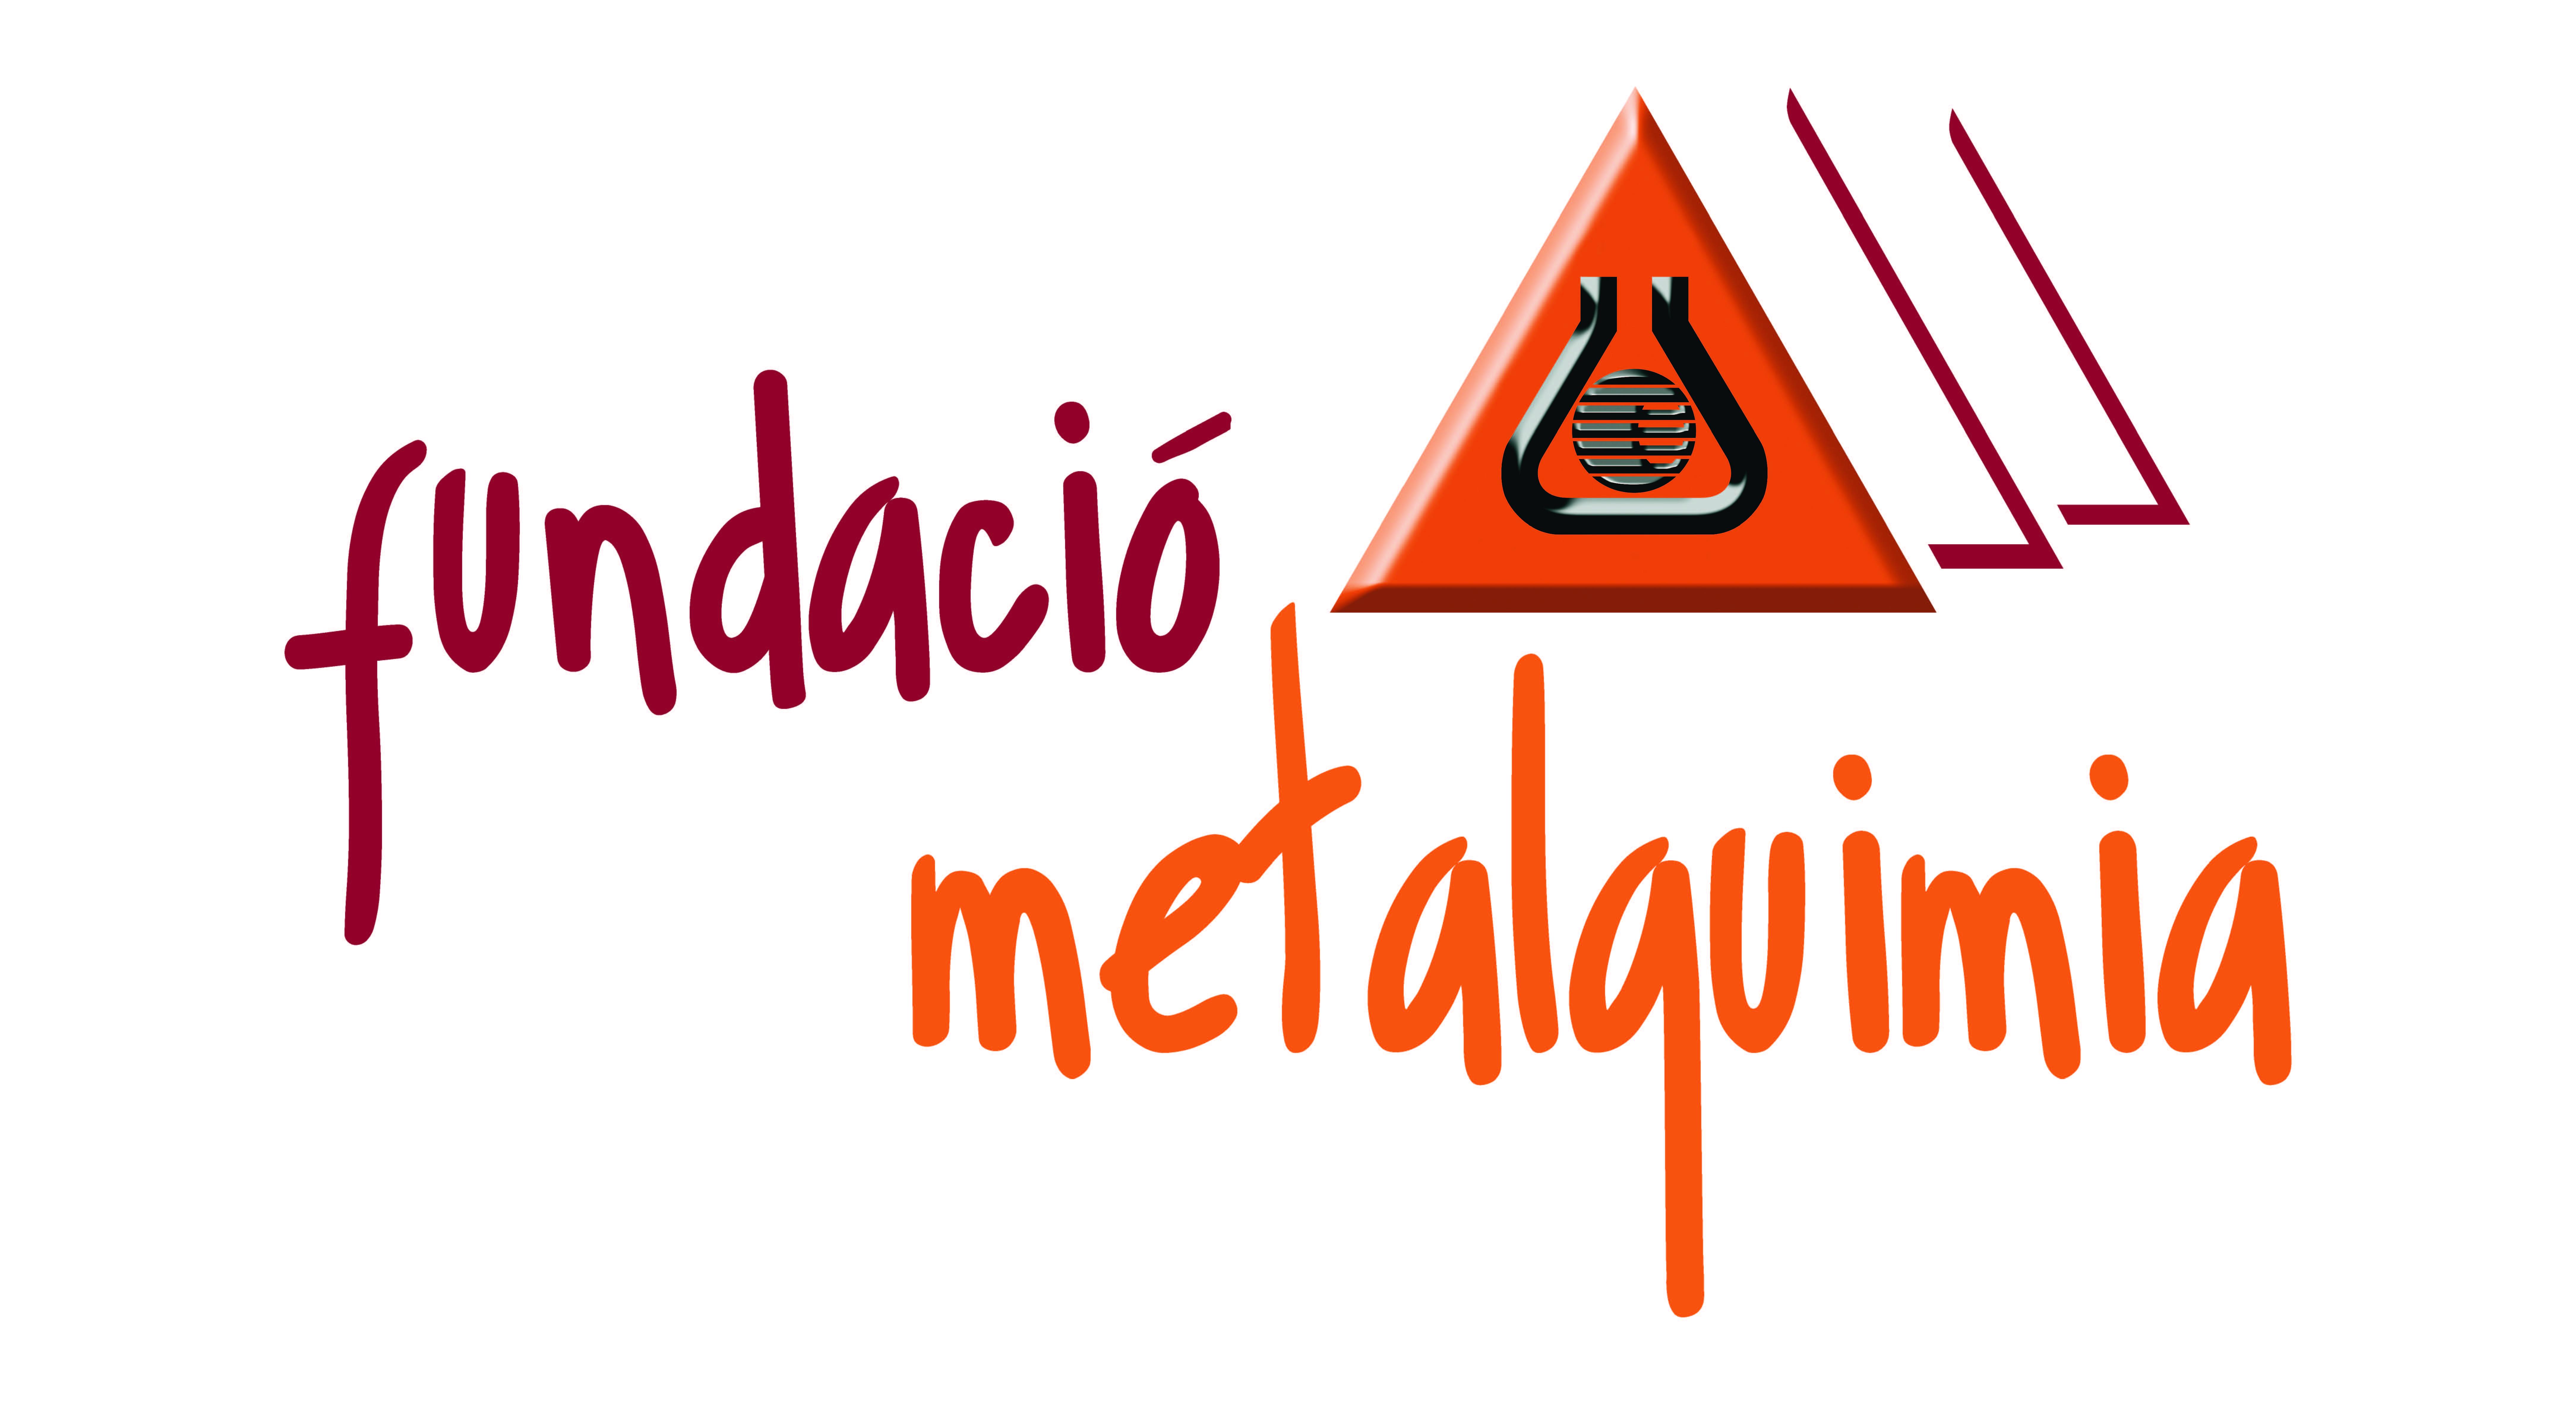 Logo metalquimia